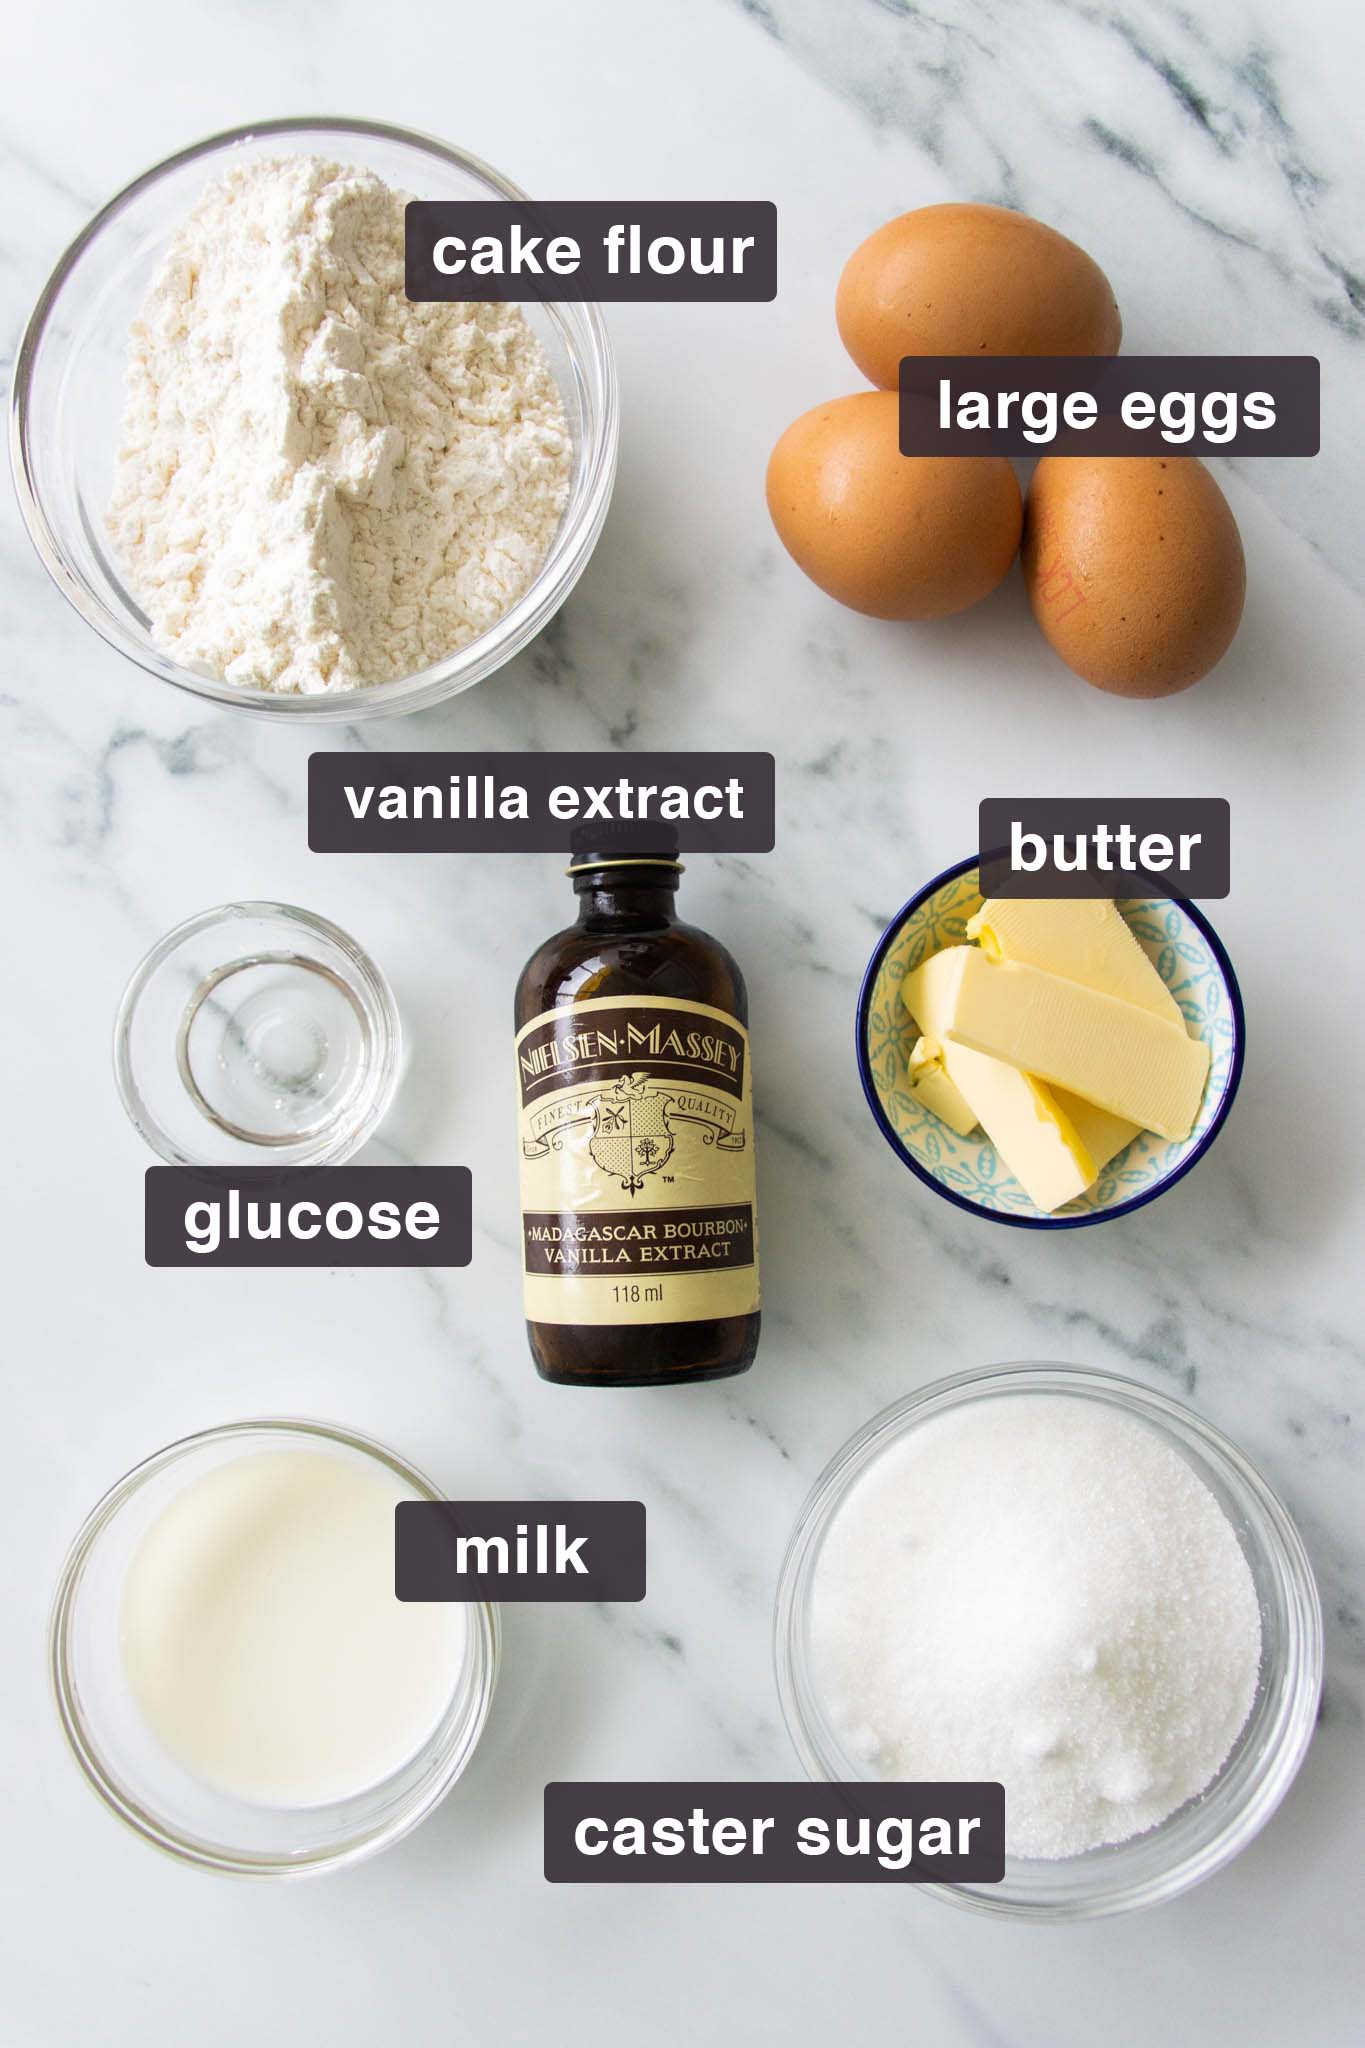 Ingredients for genoise sponge cake